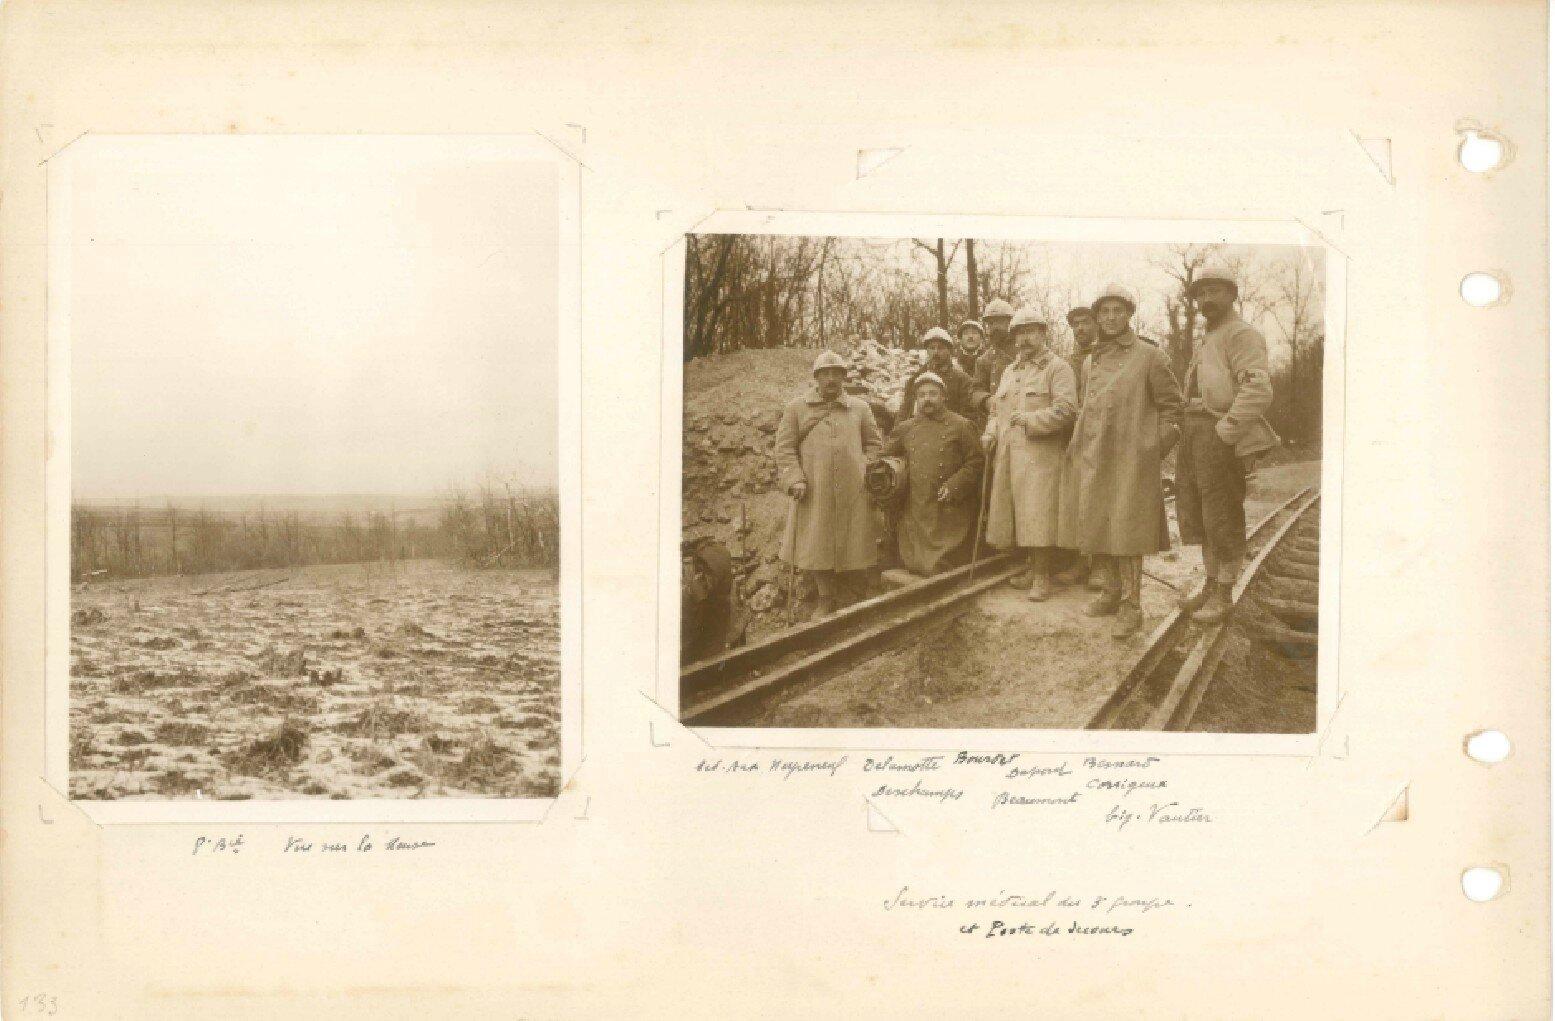 p.133 - Verdun (29 mars – 20 juin 1916)